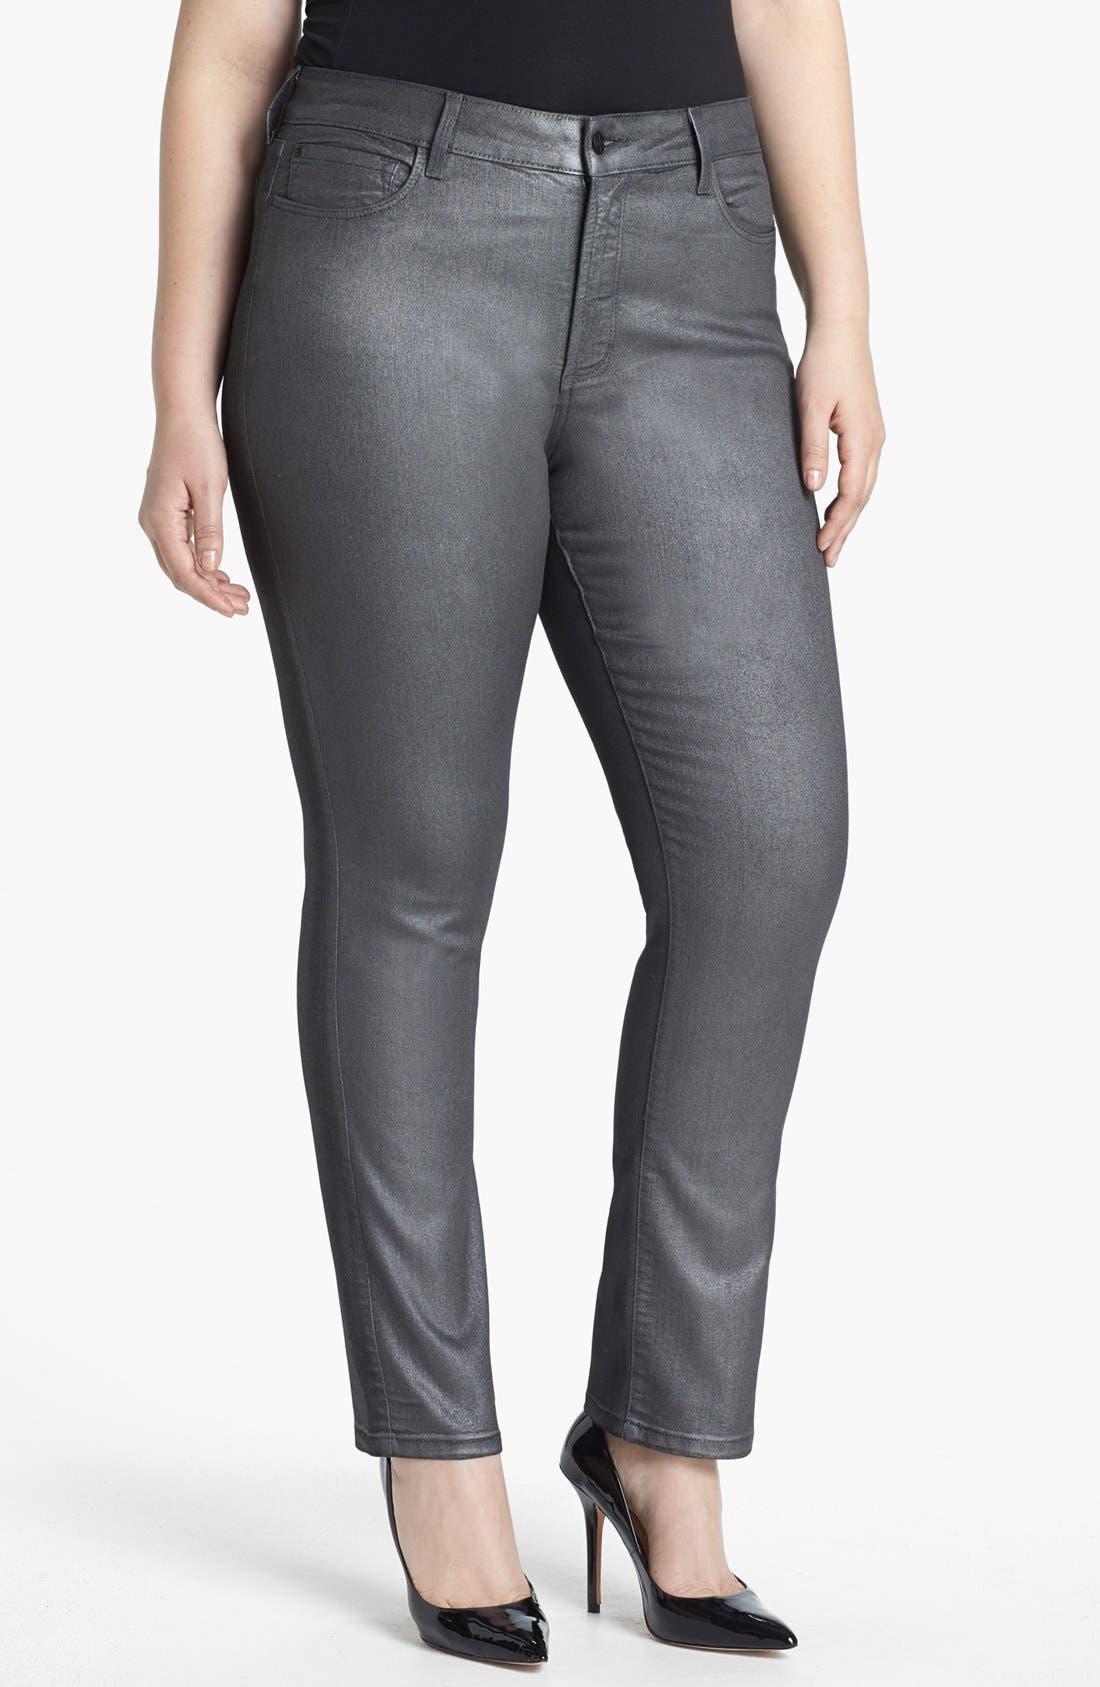 Alternate Image 1 Selected - NYDJ 'Sheri' Foiled Stretch Skinny Jeans (Plus Size)